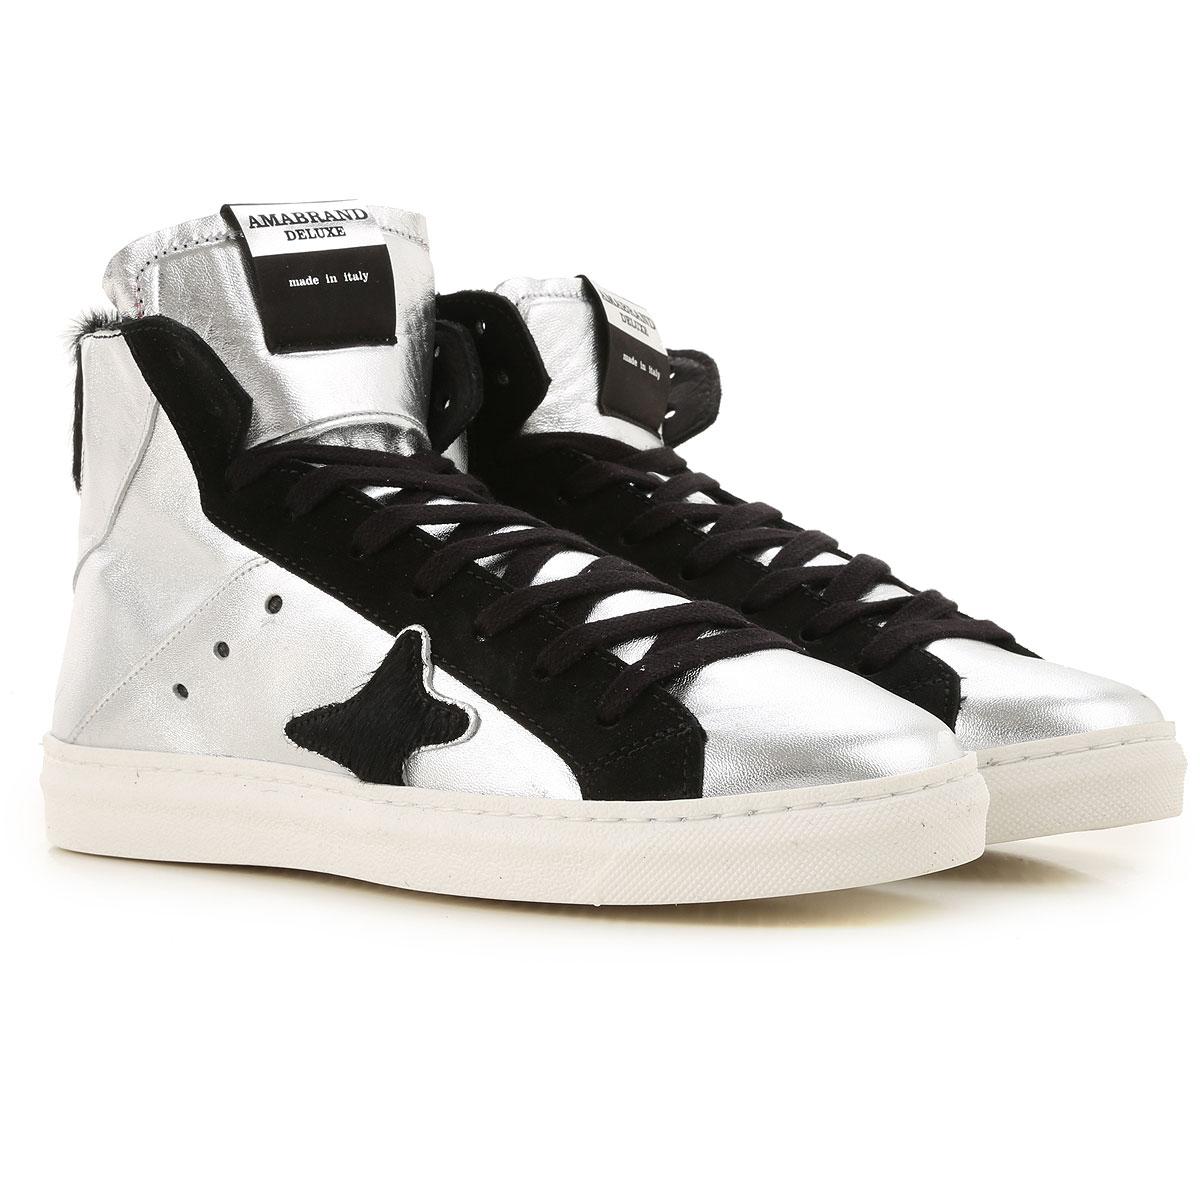 Ama Brand Sneakers for Women, Metallic Silver, Leather, 2019, EUR 37 - UK 4 - USA 6.5 EUR 38 - UK 5 - USA 7.5 EUR 40 - UK 7 - USA 9.5